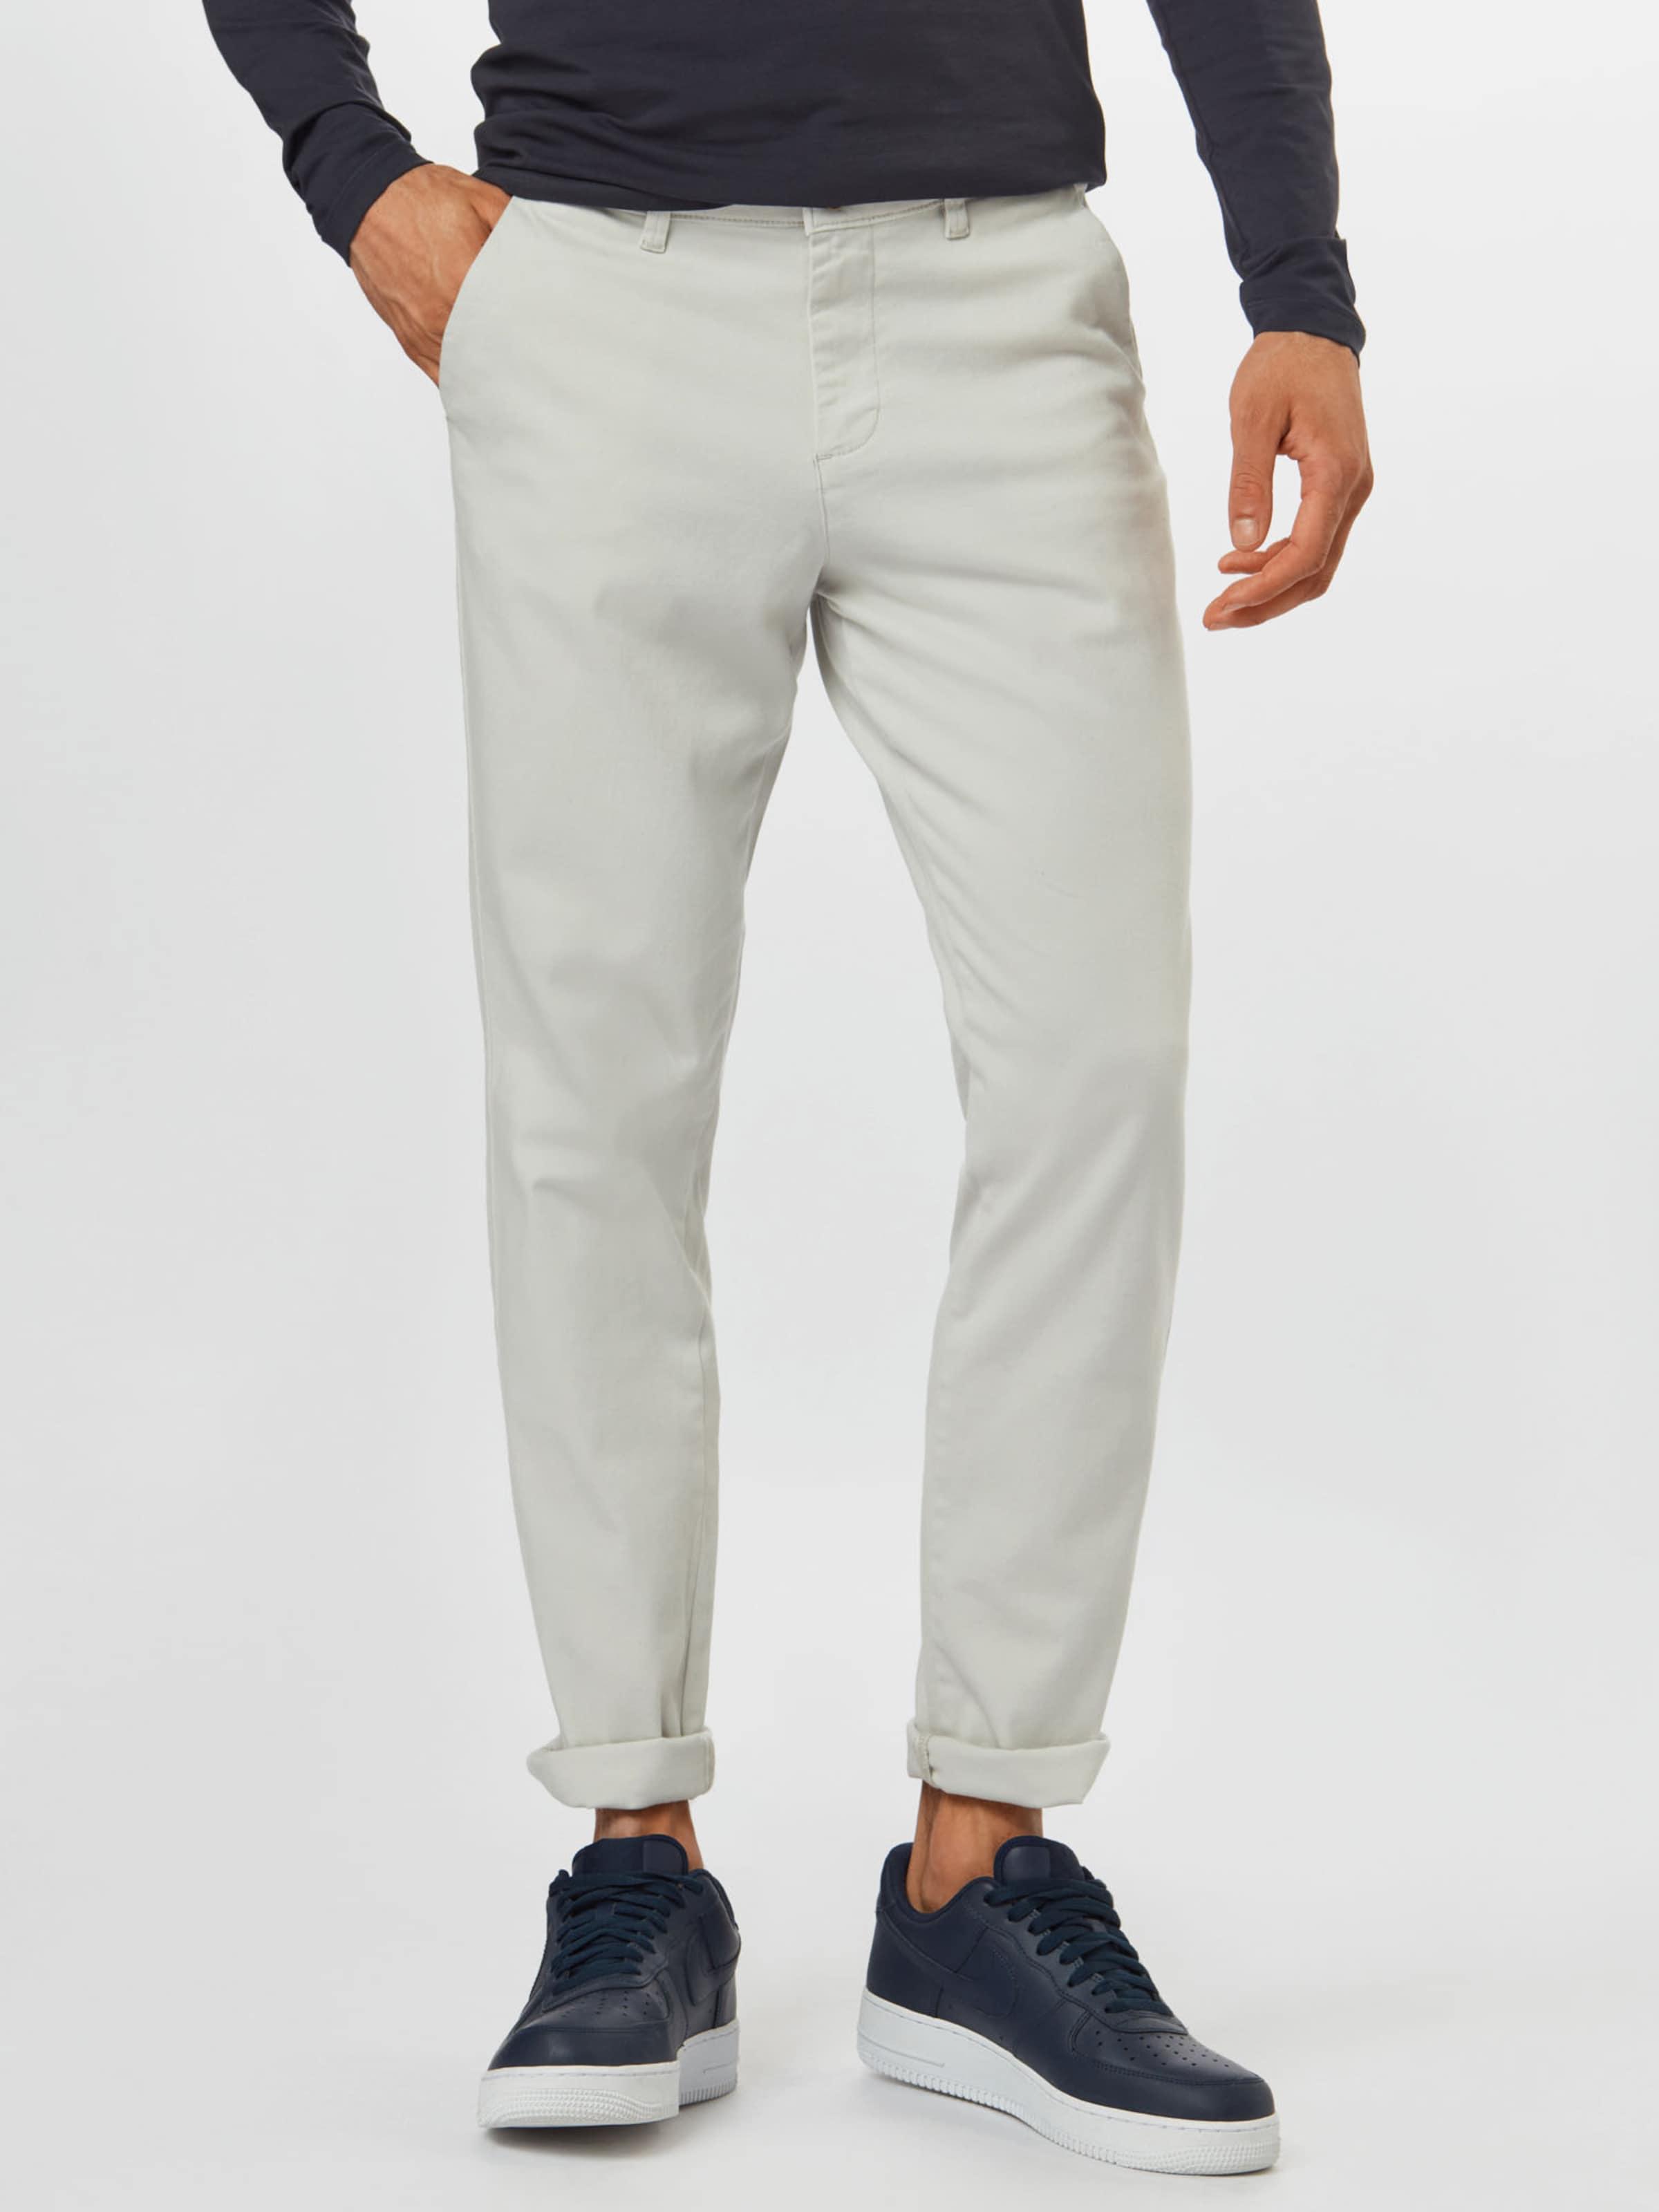 Jack /& Jones Homme Pantalon Chino Marco Dave